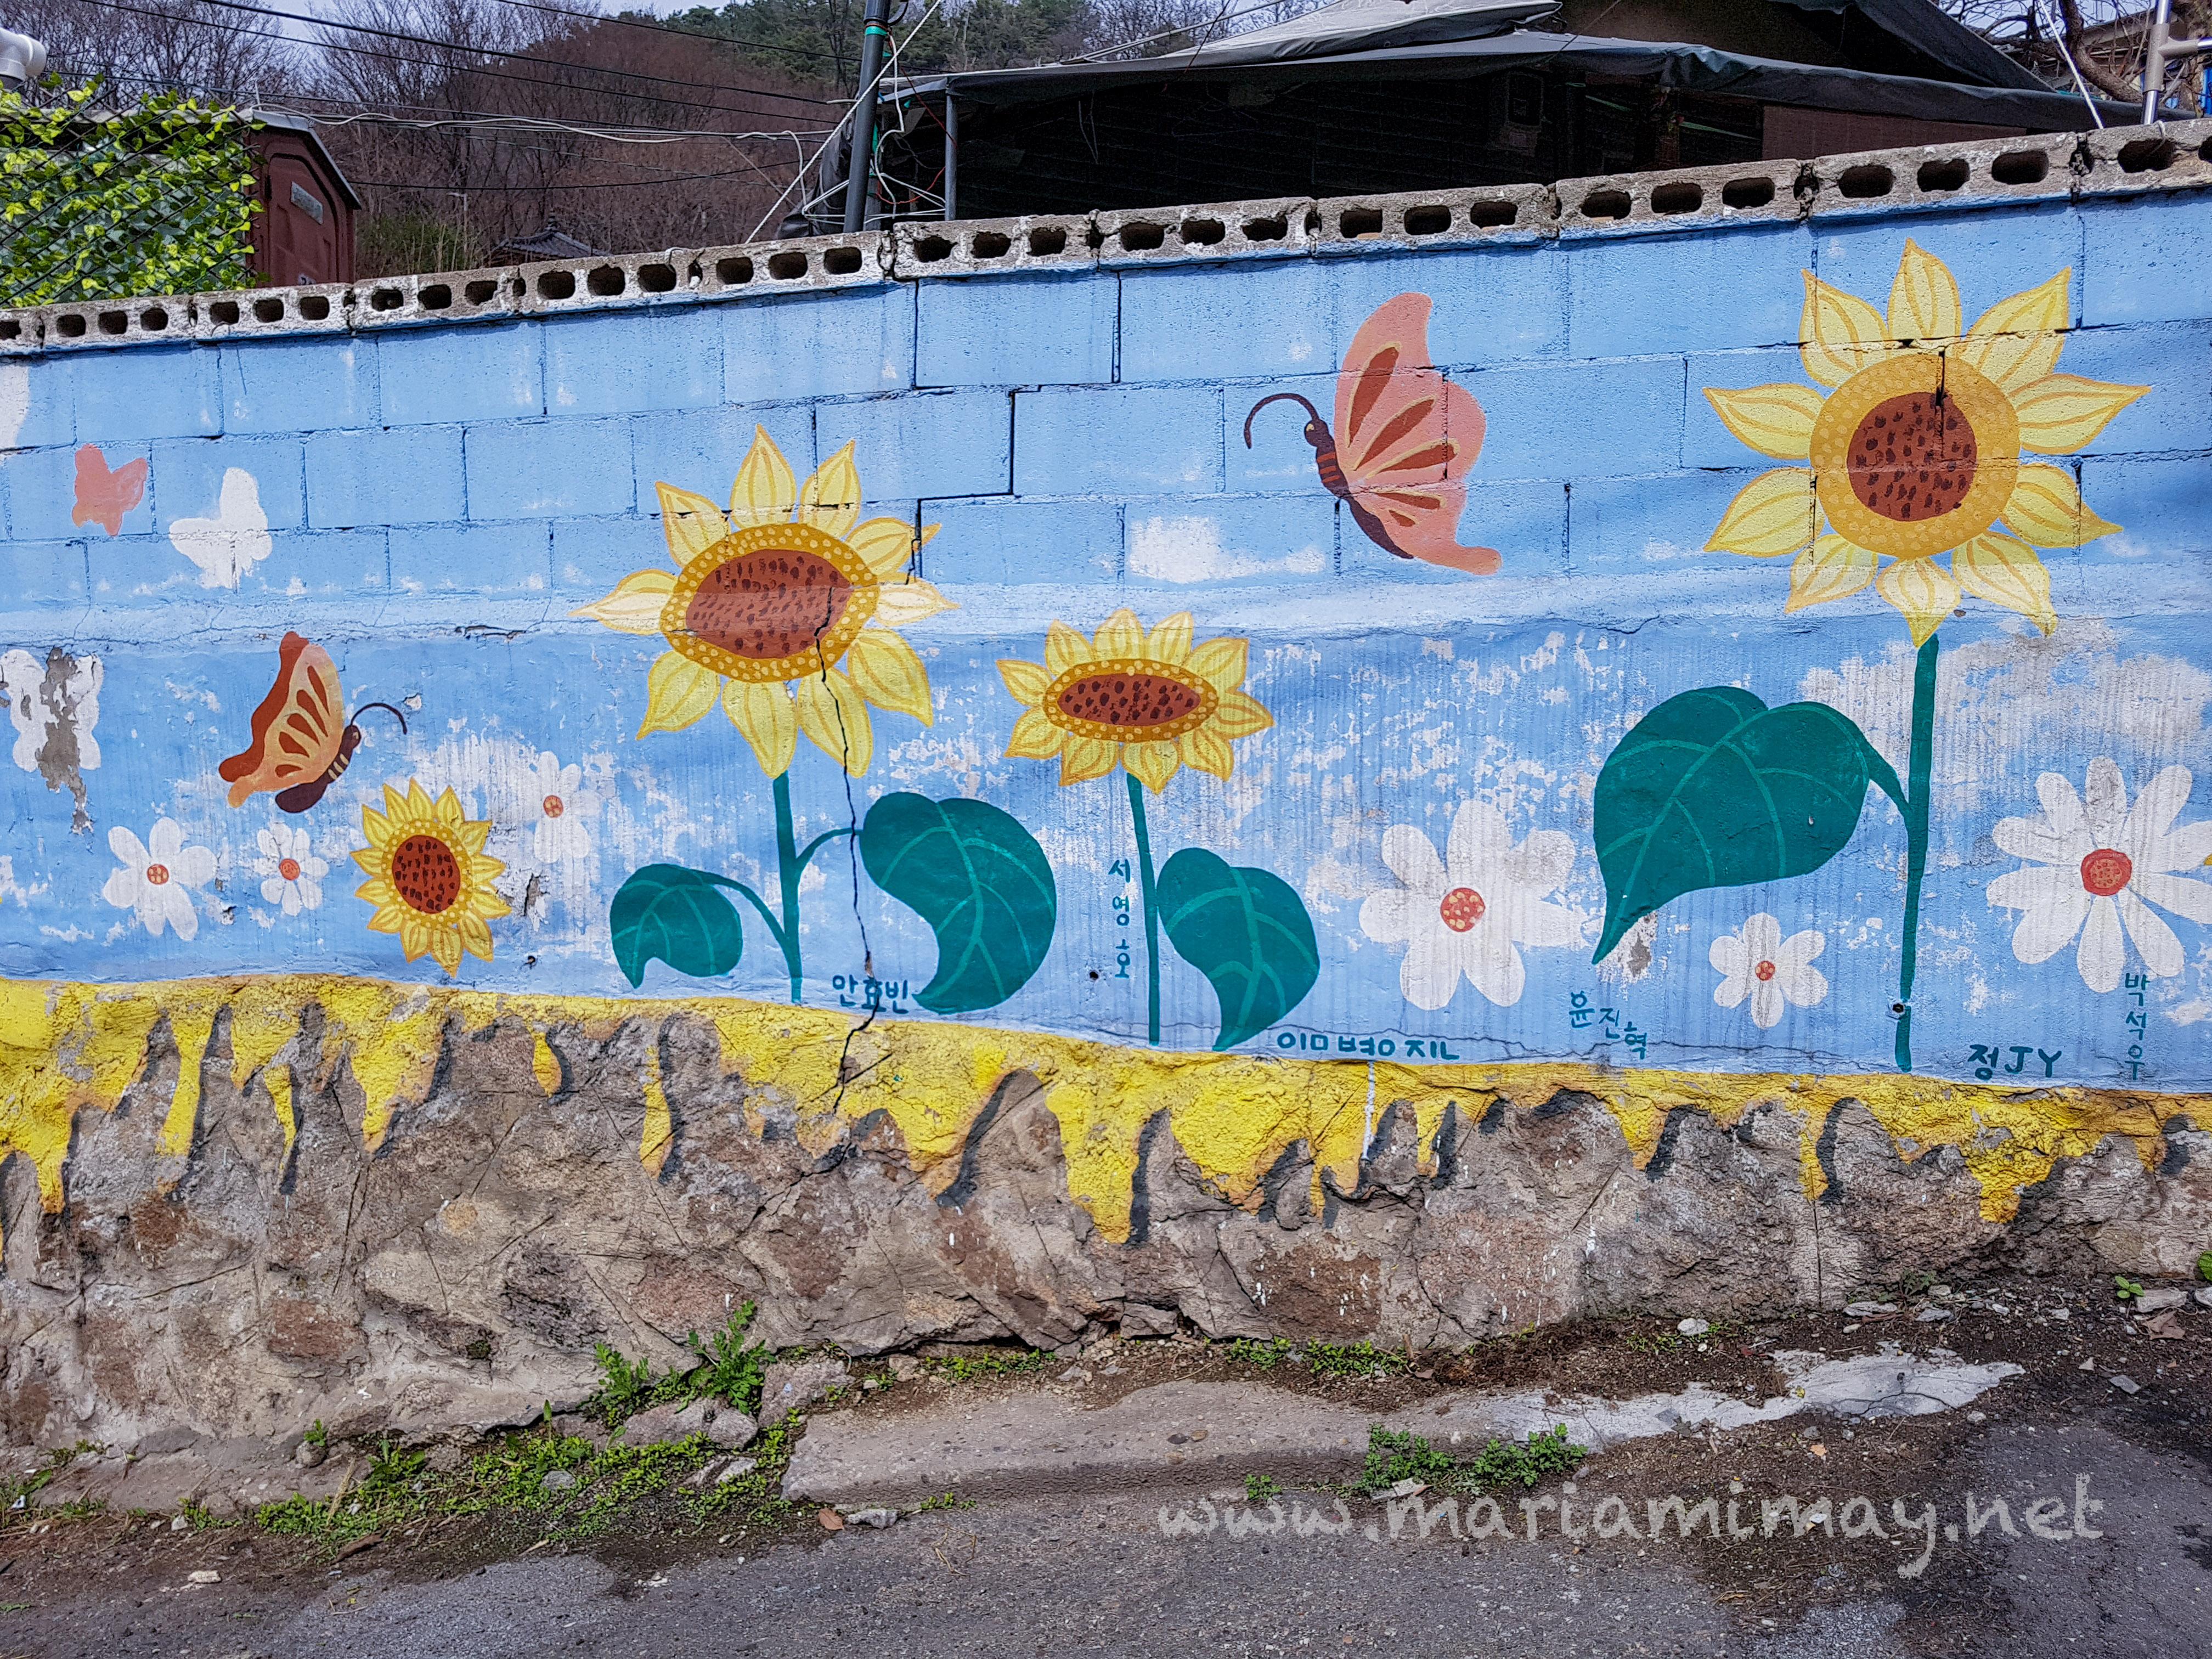 Gaemi maeul seoul a mural village when in south korea for Mural village seoul